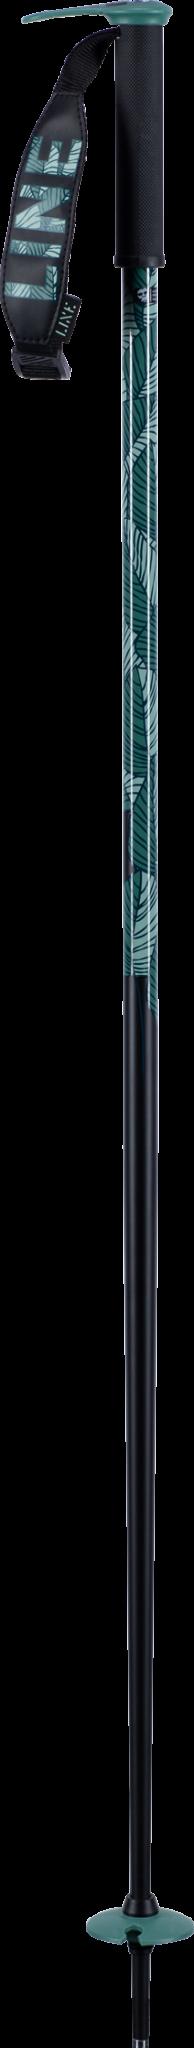 LINE Line Women's Hairpin Ski Pole (2021)